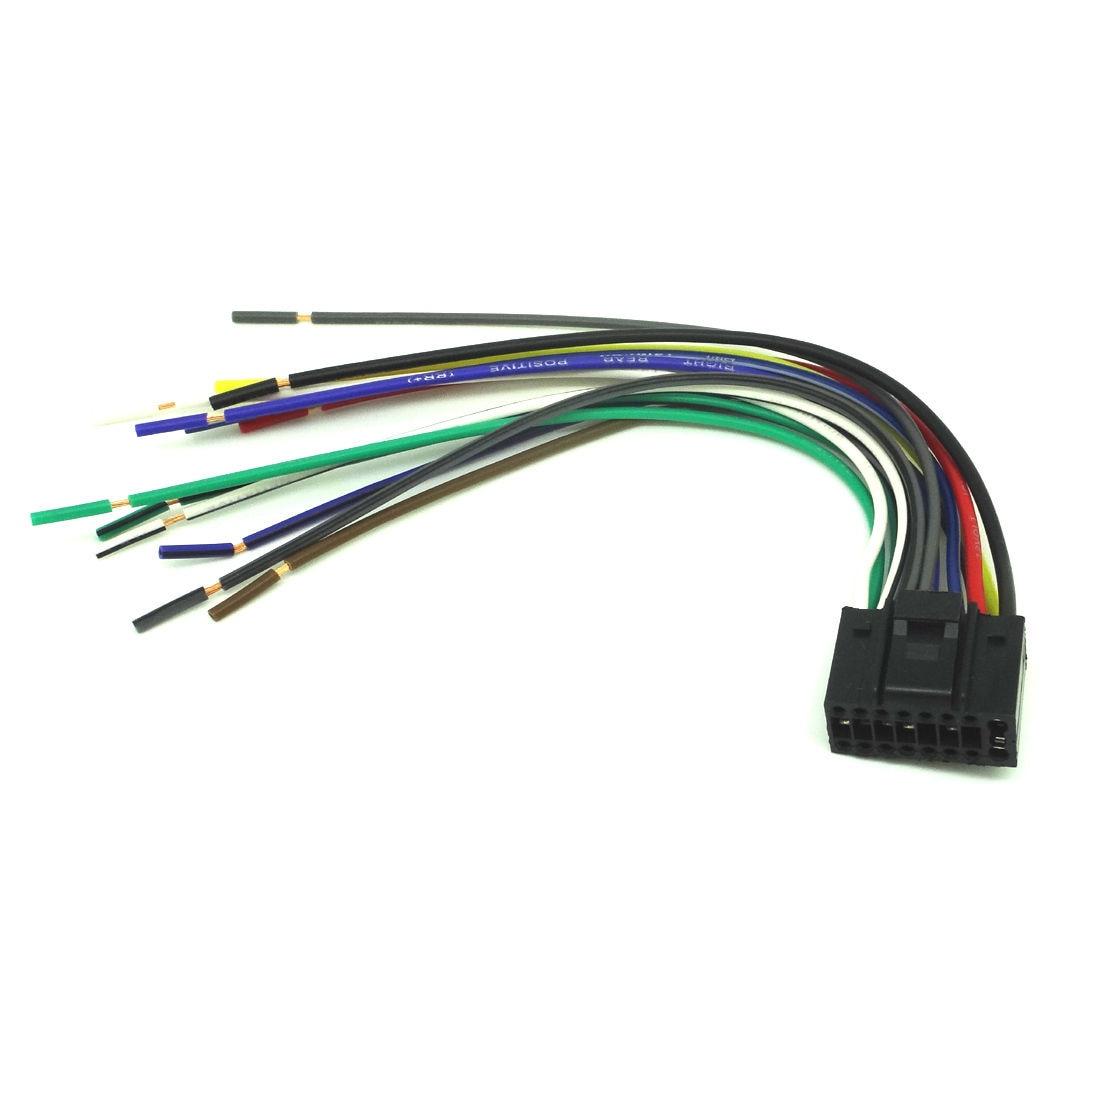 medium resolution of kenwood kdc 128 wiring harness kenwood pin wiring harness diagramkenwood pin wiring harness diagram kenwood diy